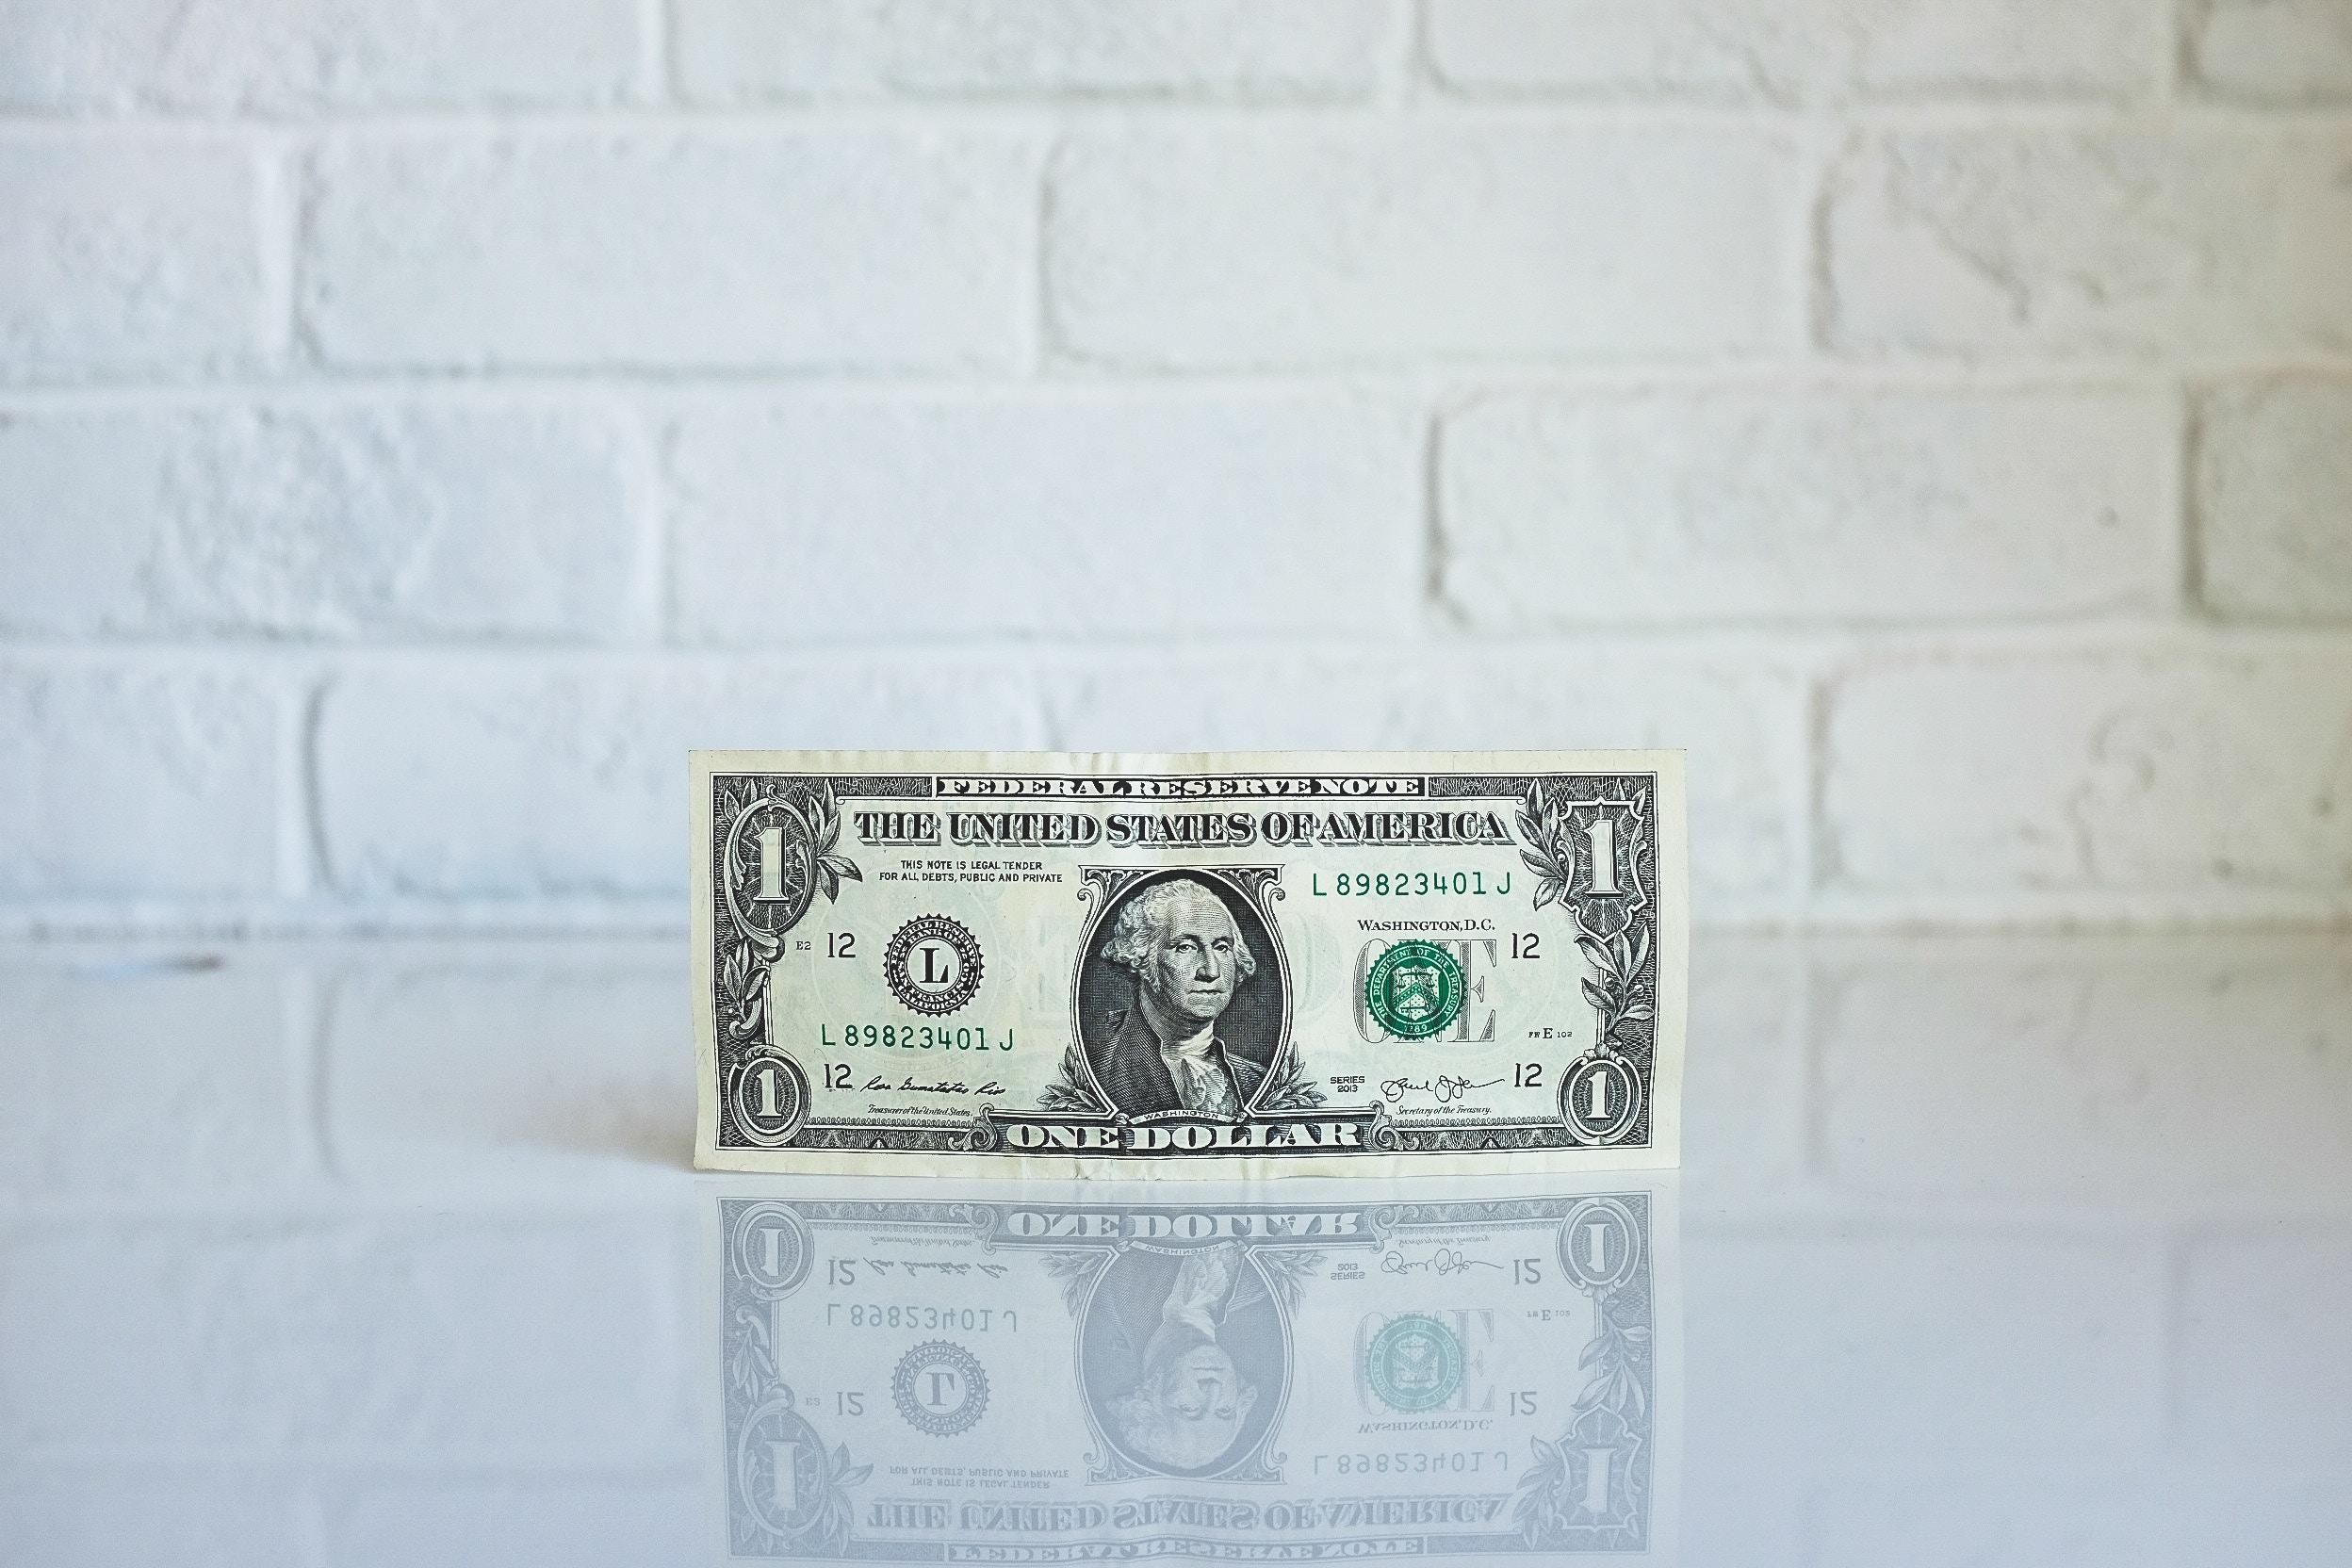 Sba Working Capital Loan Cash Flowysis